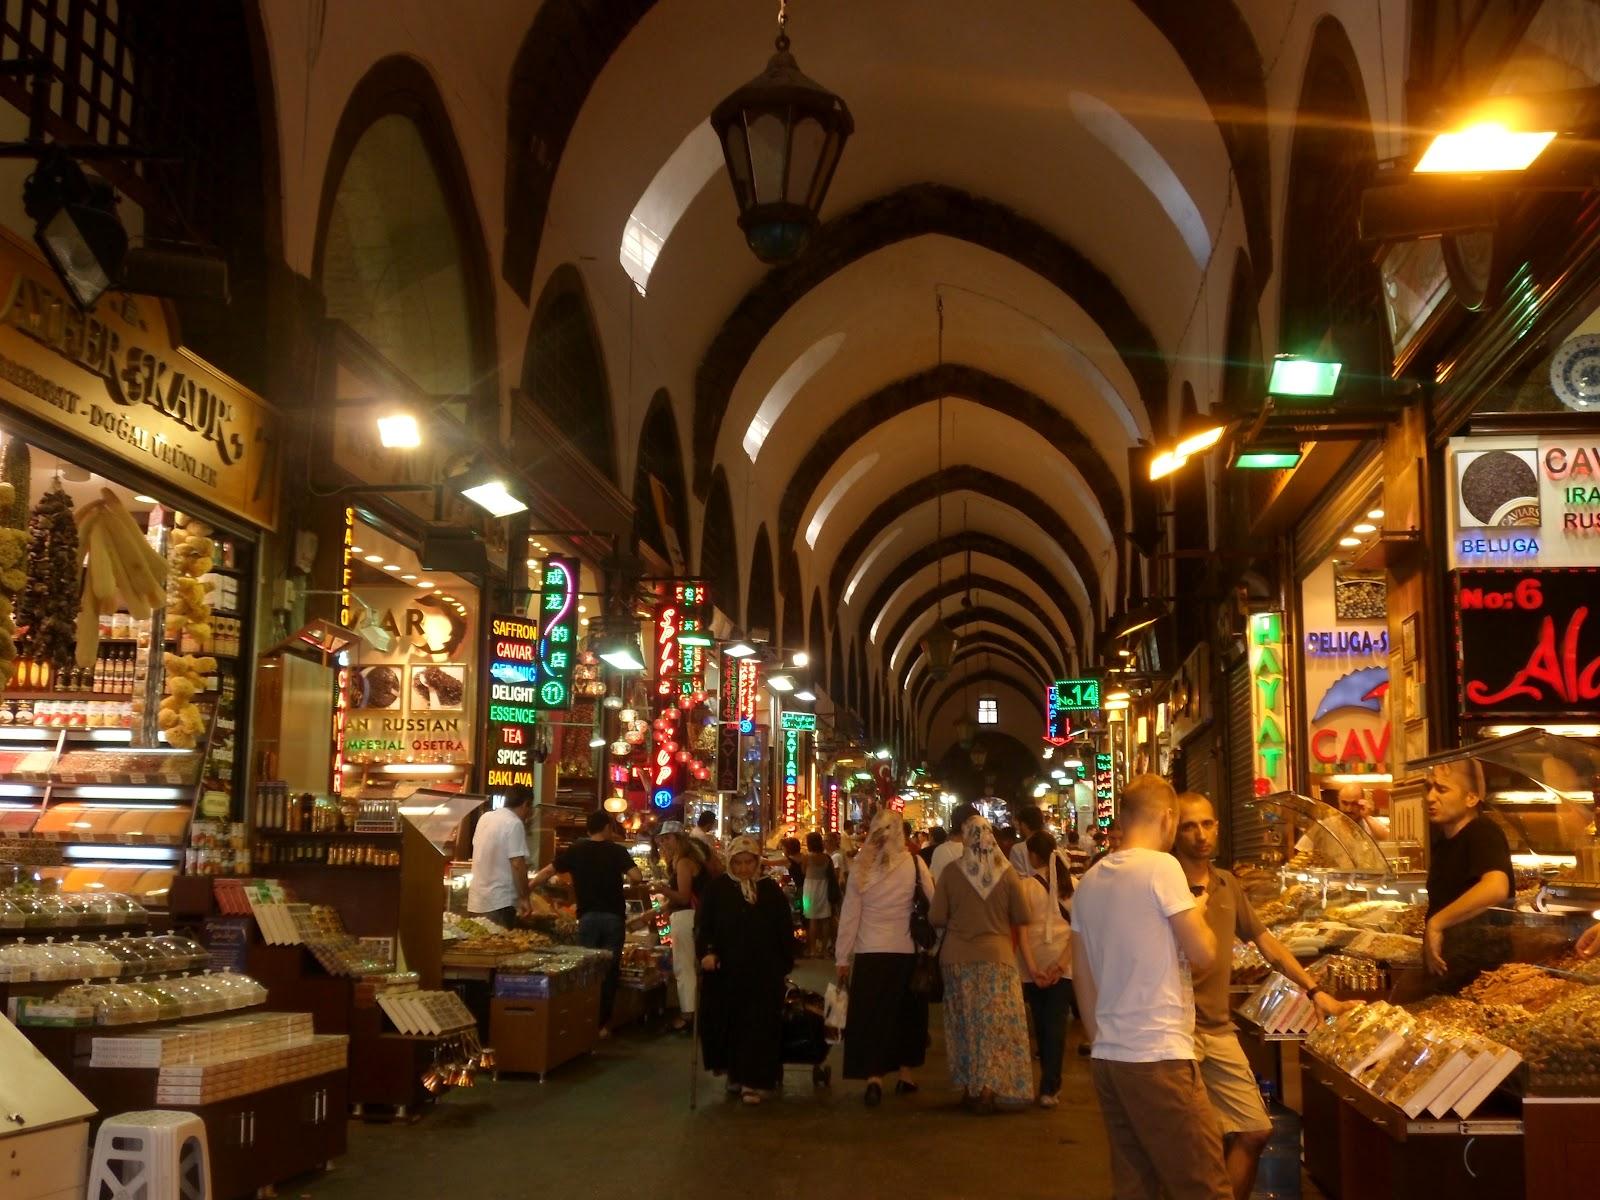 SPICE BAZAAR OF ISTANBUL  Travel to Turkey